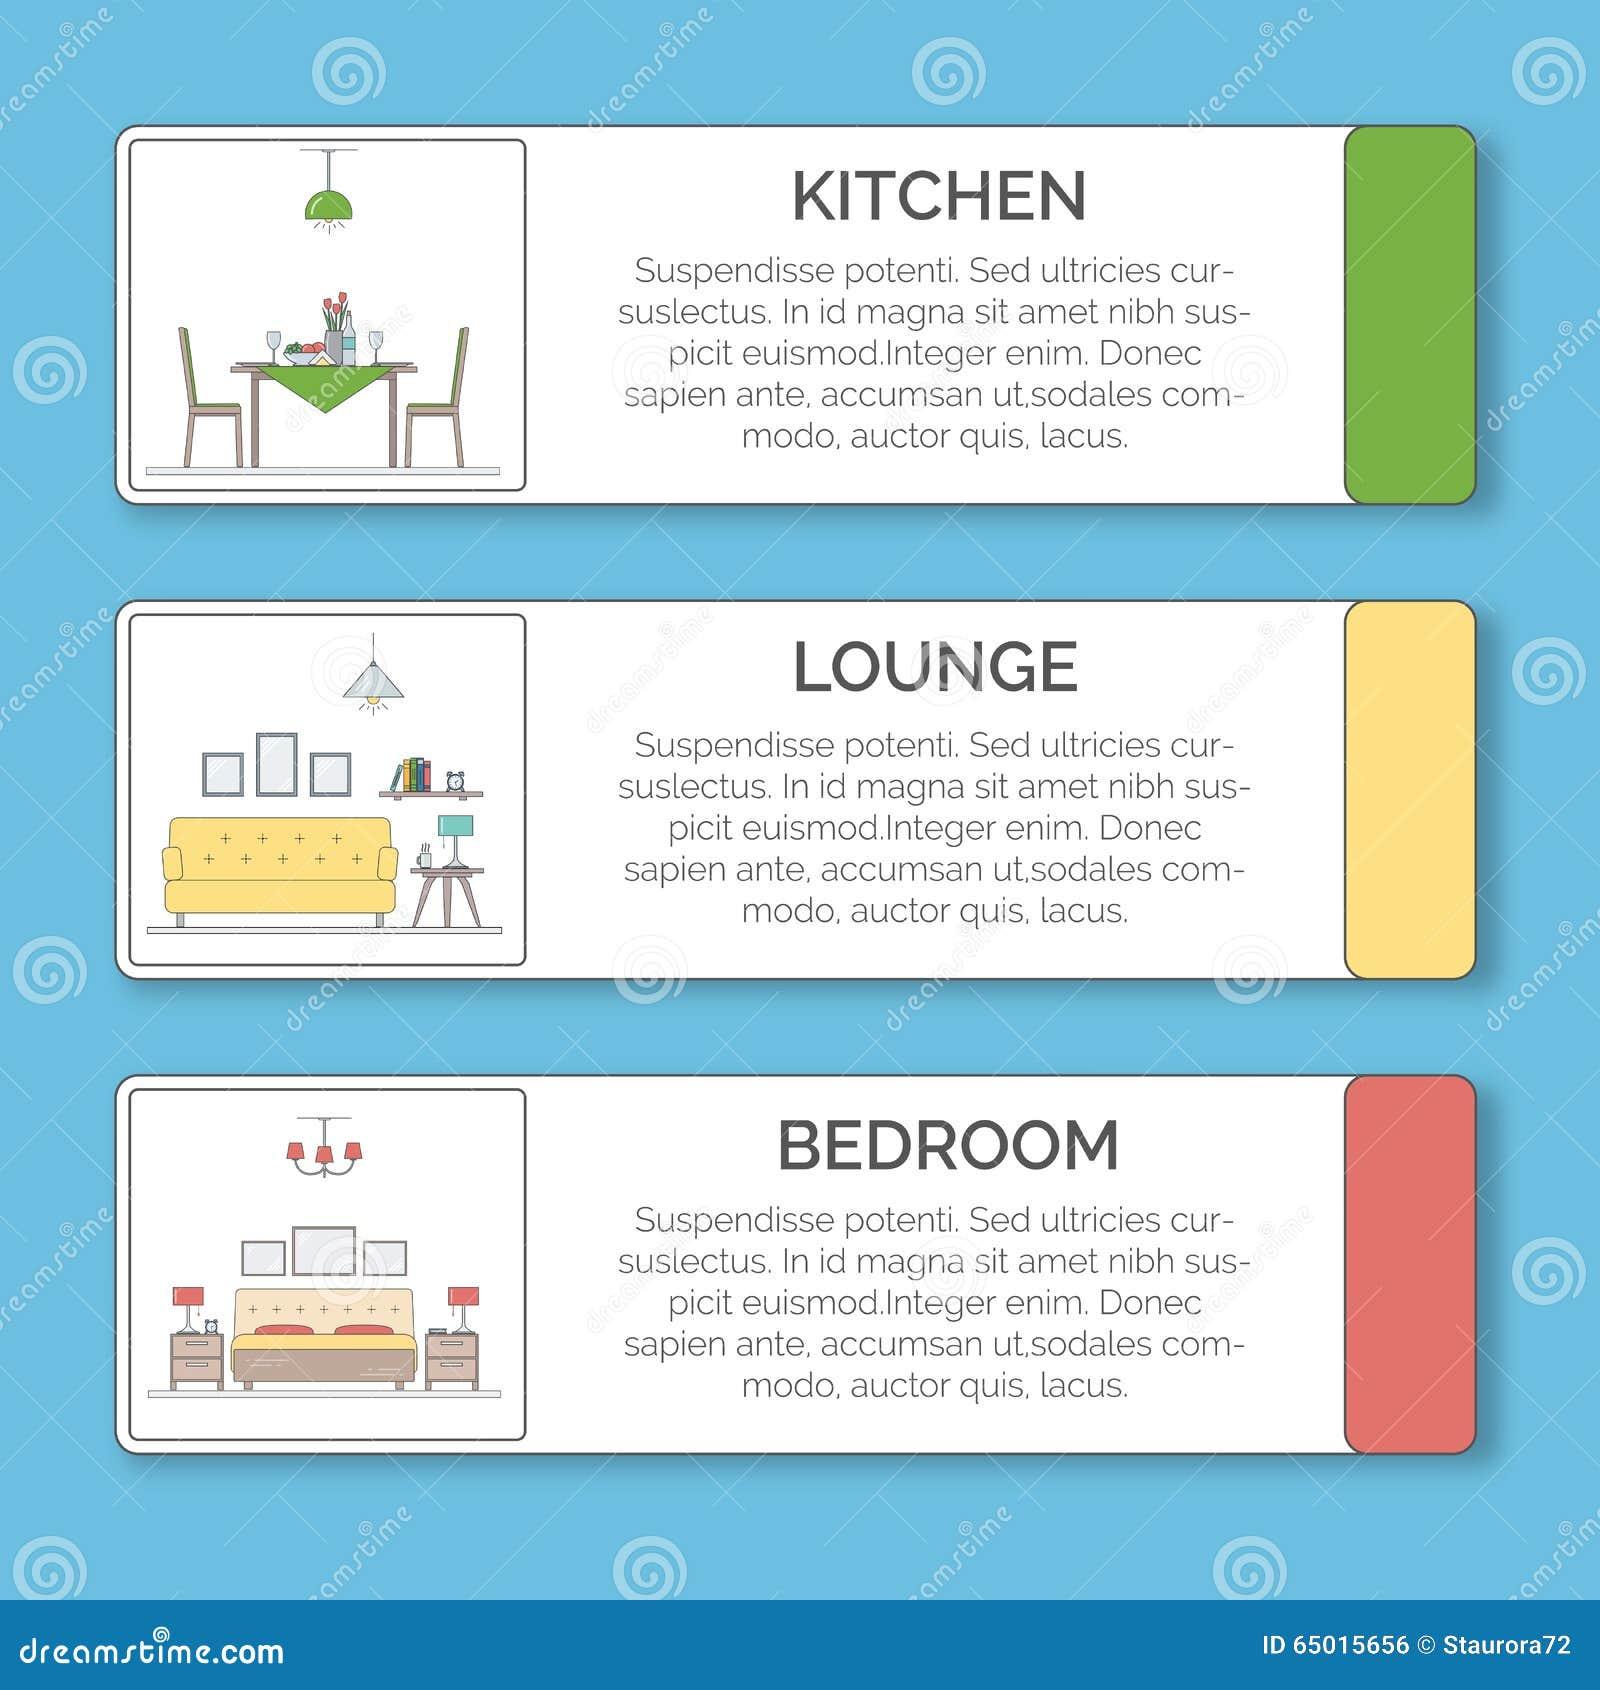 Living Room Interior Design Infographic Template Vector Illustration 91837900